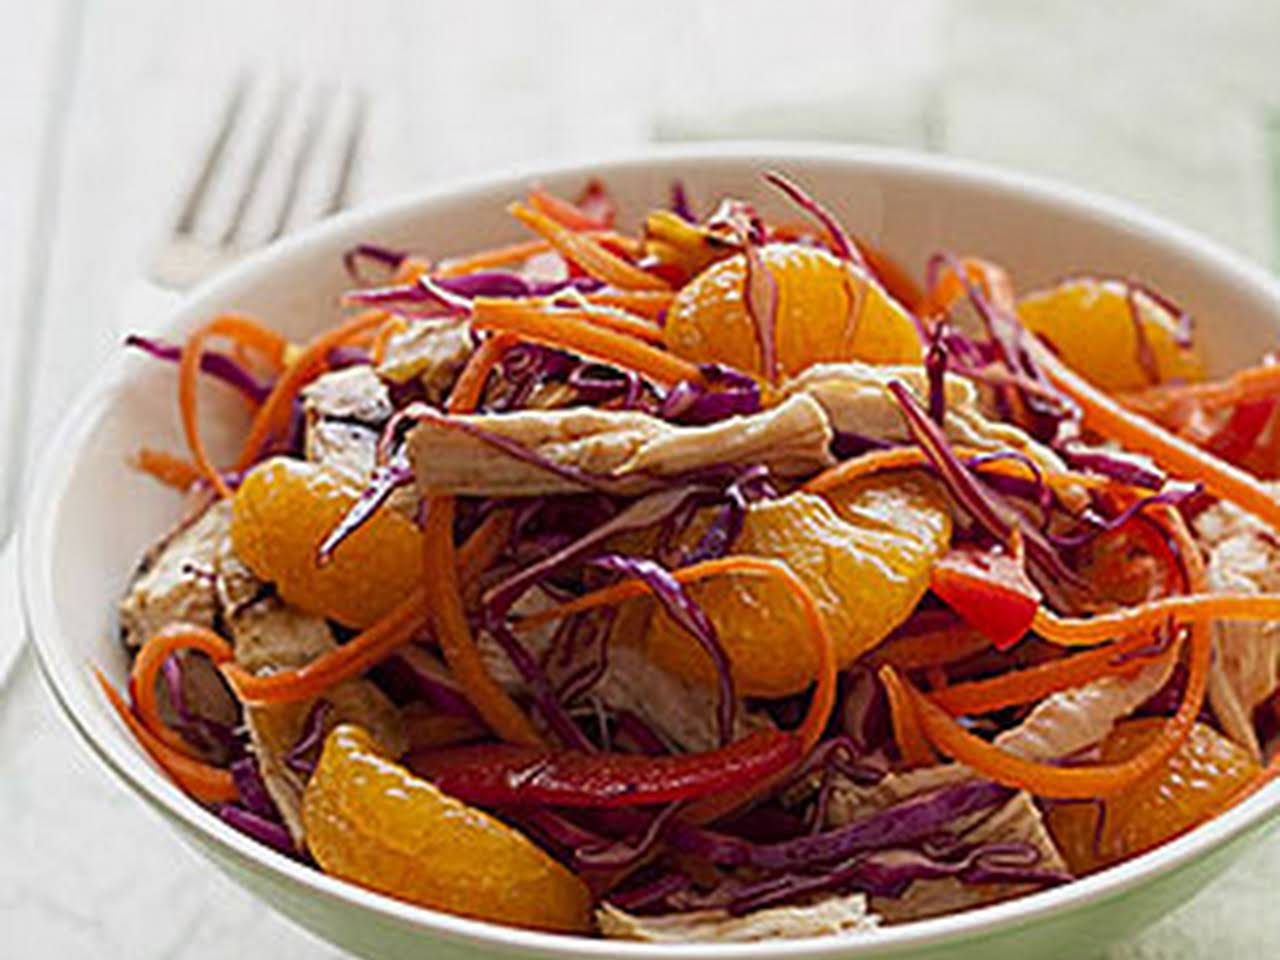 10 Best Shredded Chicken Salad Recipes Yummly